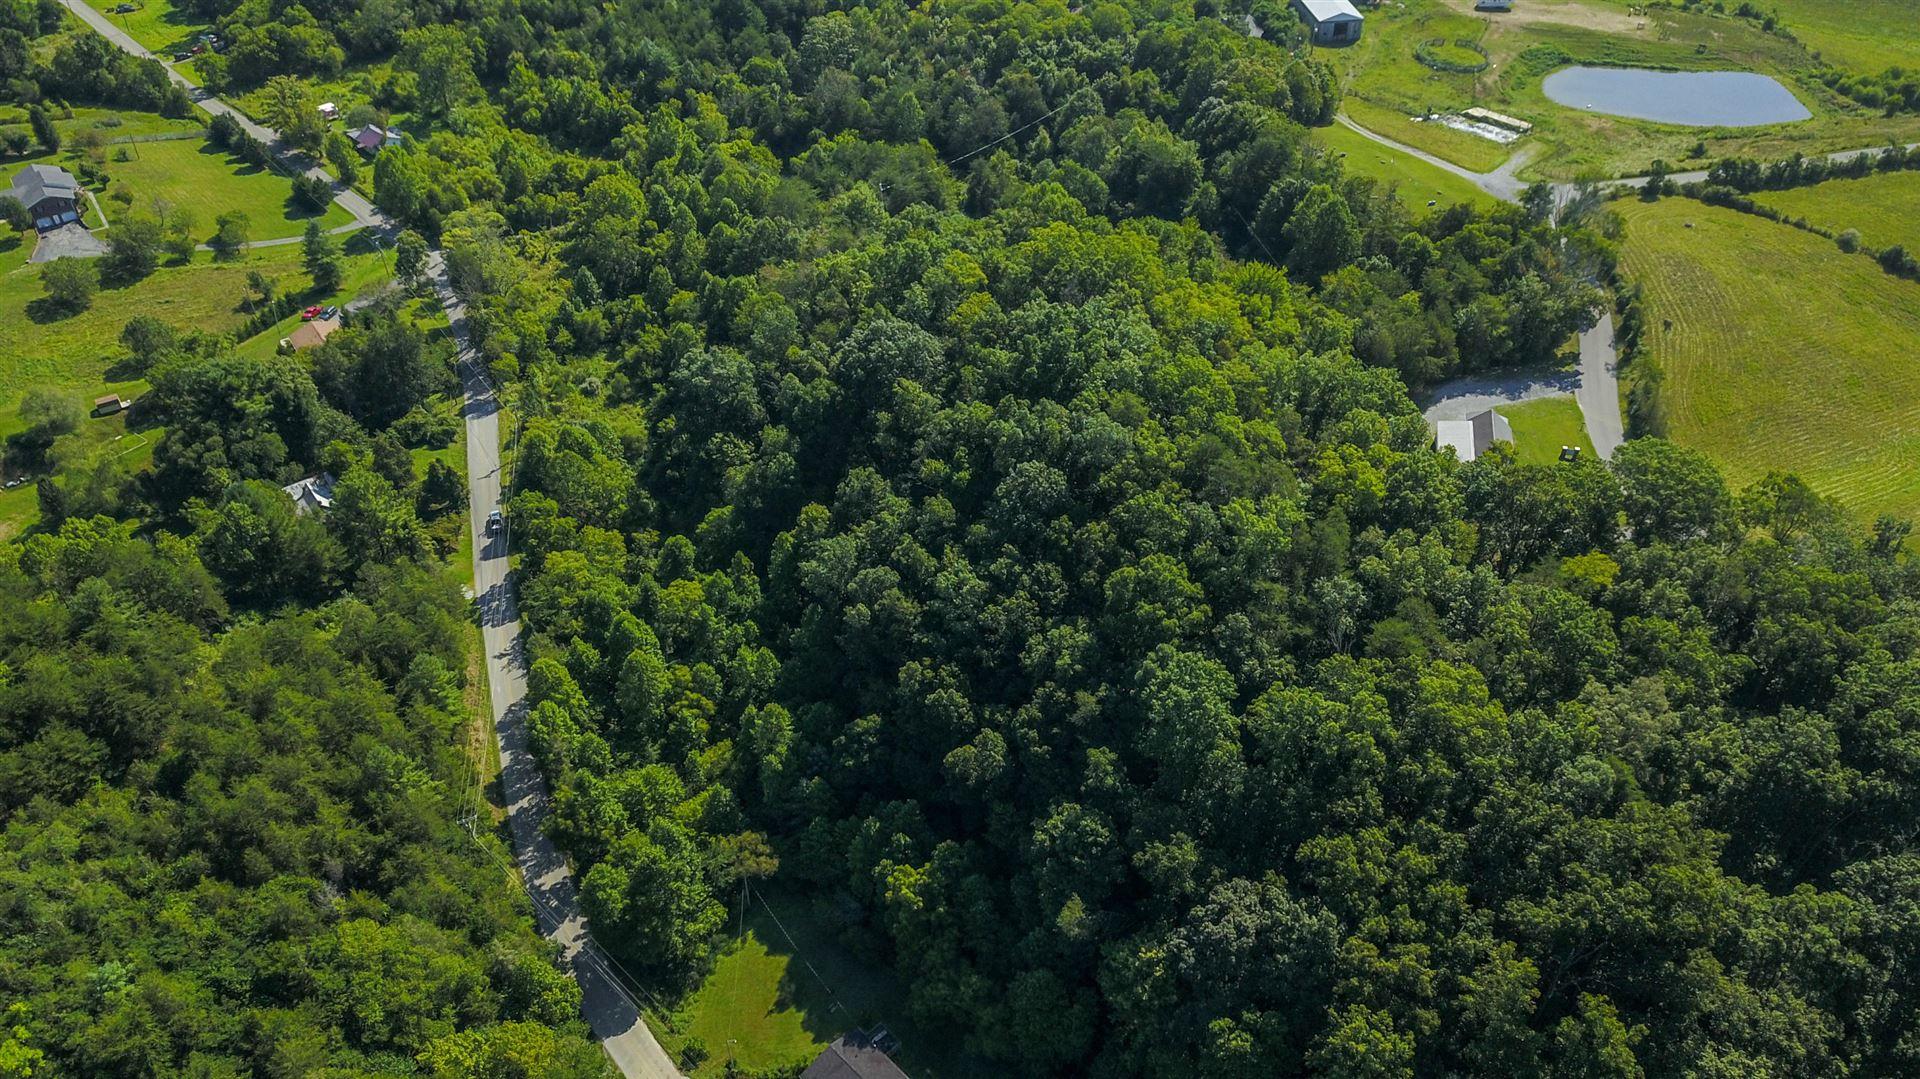 Photo of Tbd Oak Glen Circle, Fall Branch, TN 37656 (MLS # 9927567)